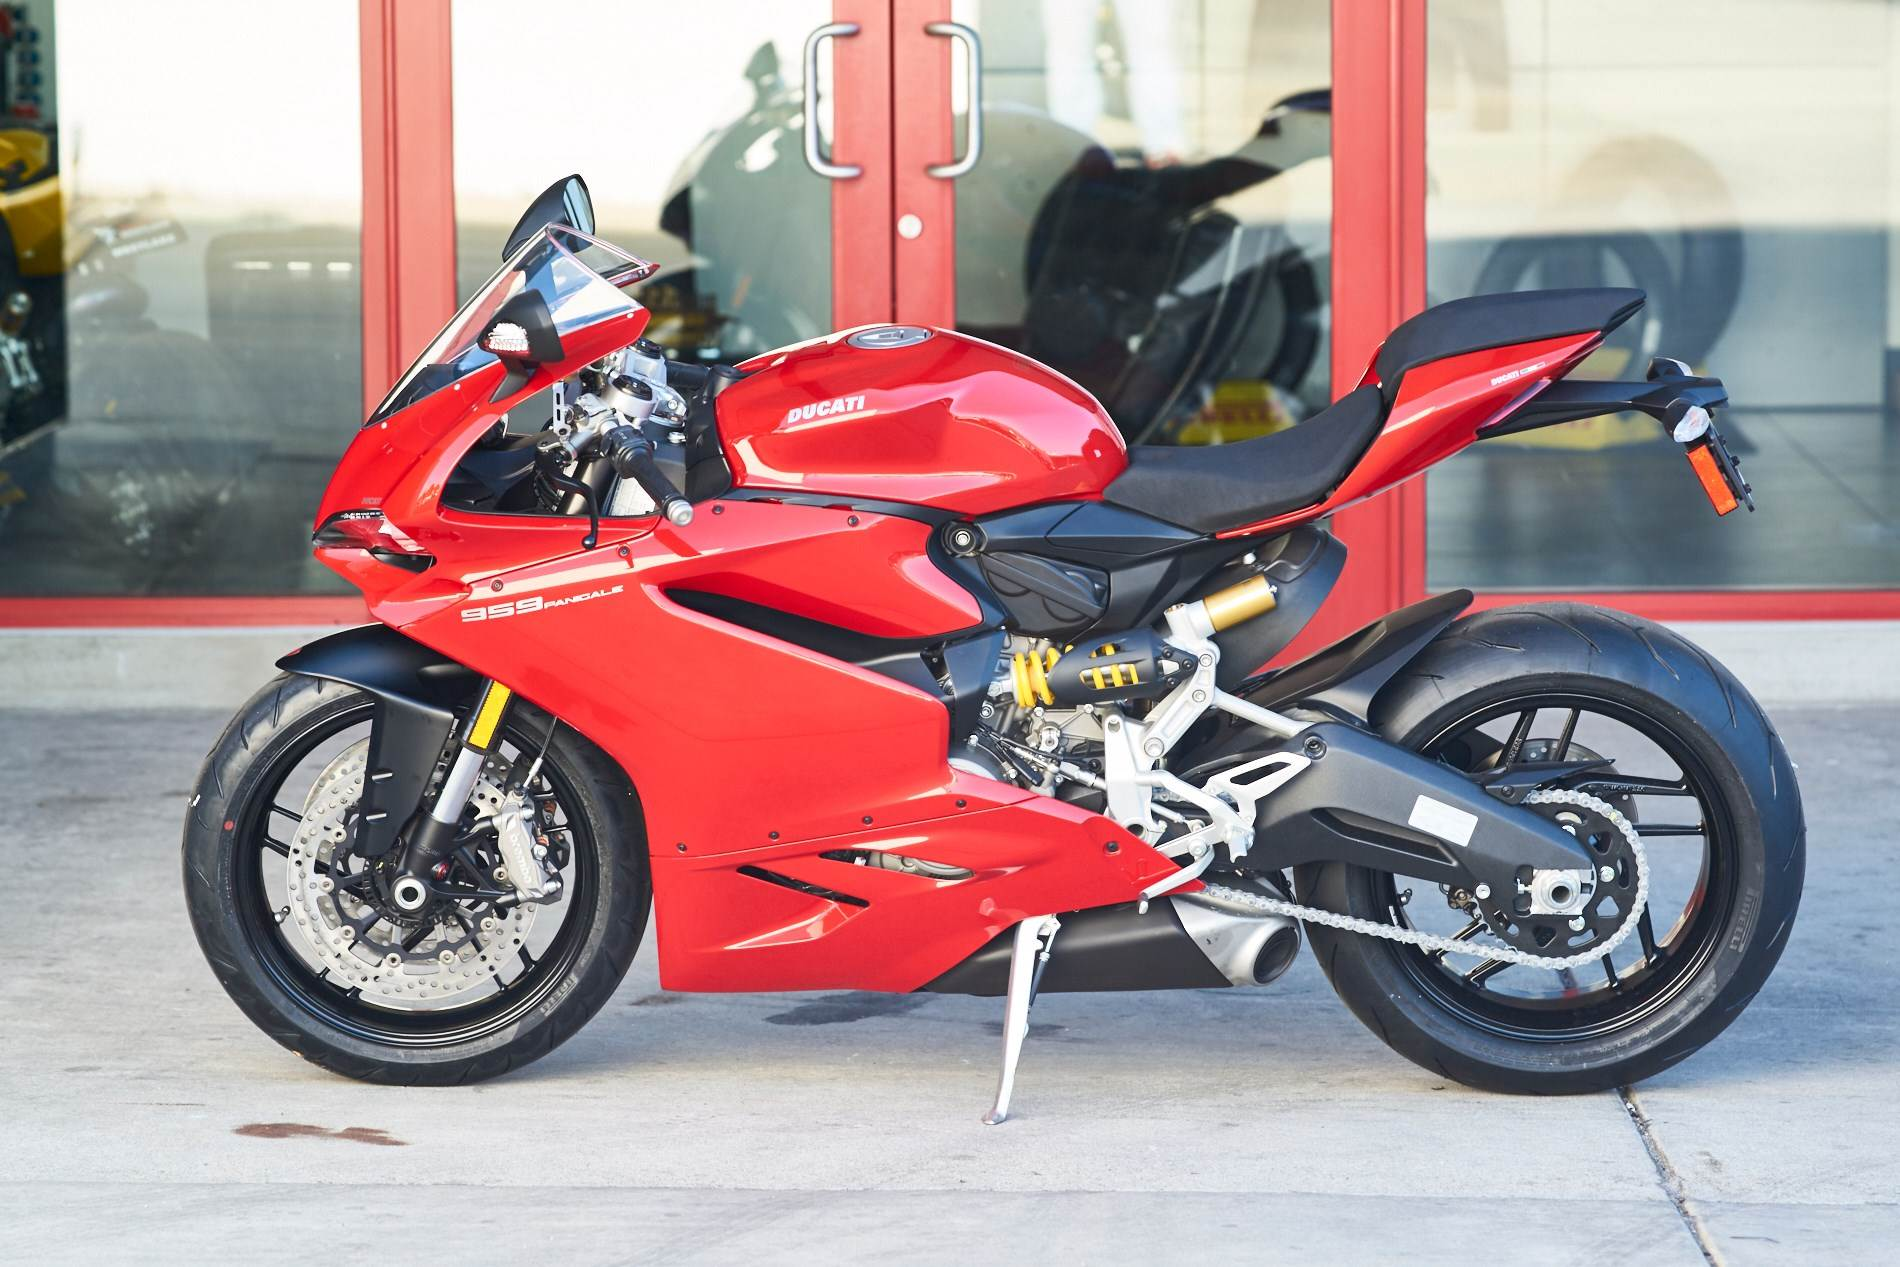 2017 ducati superbike 959 panigale (us version) motorcycles